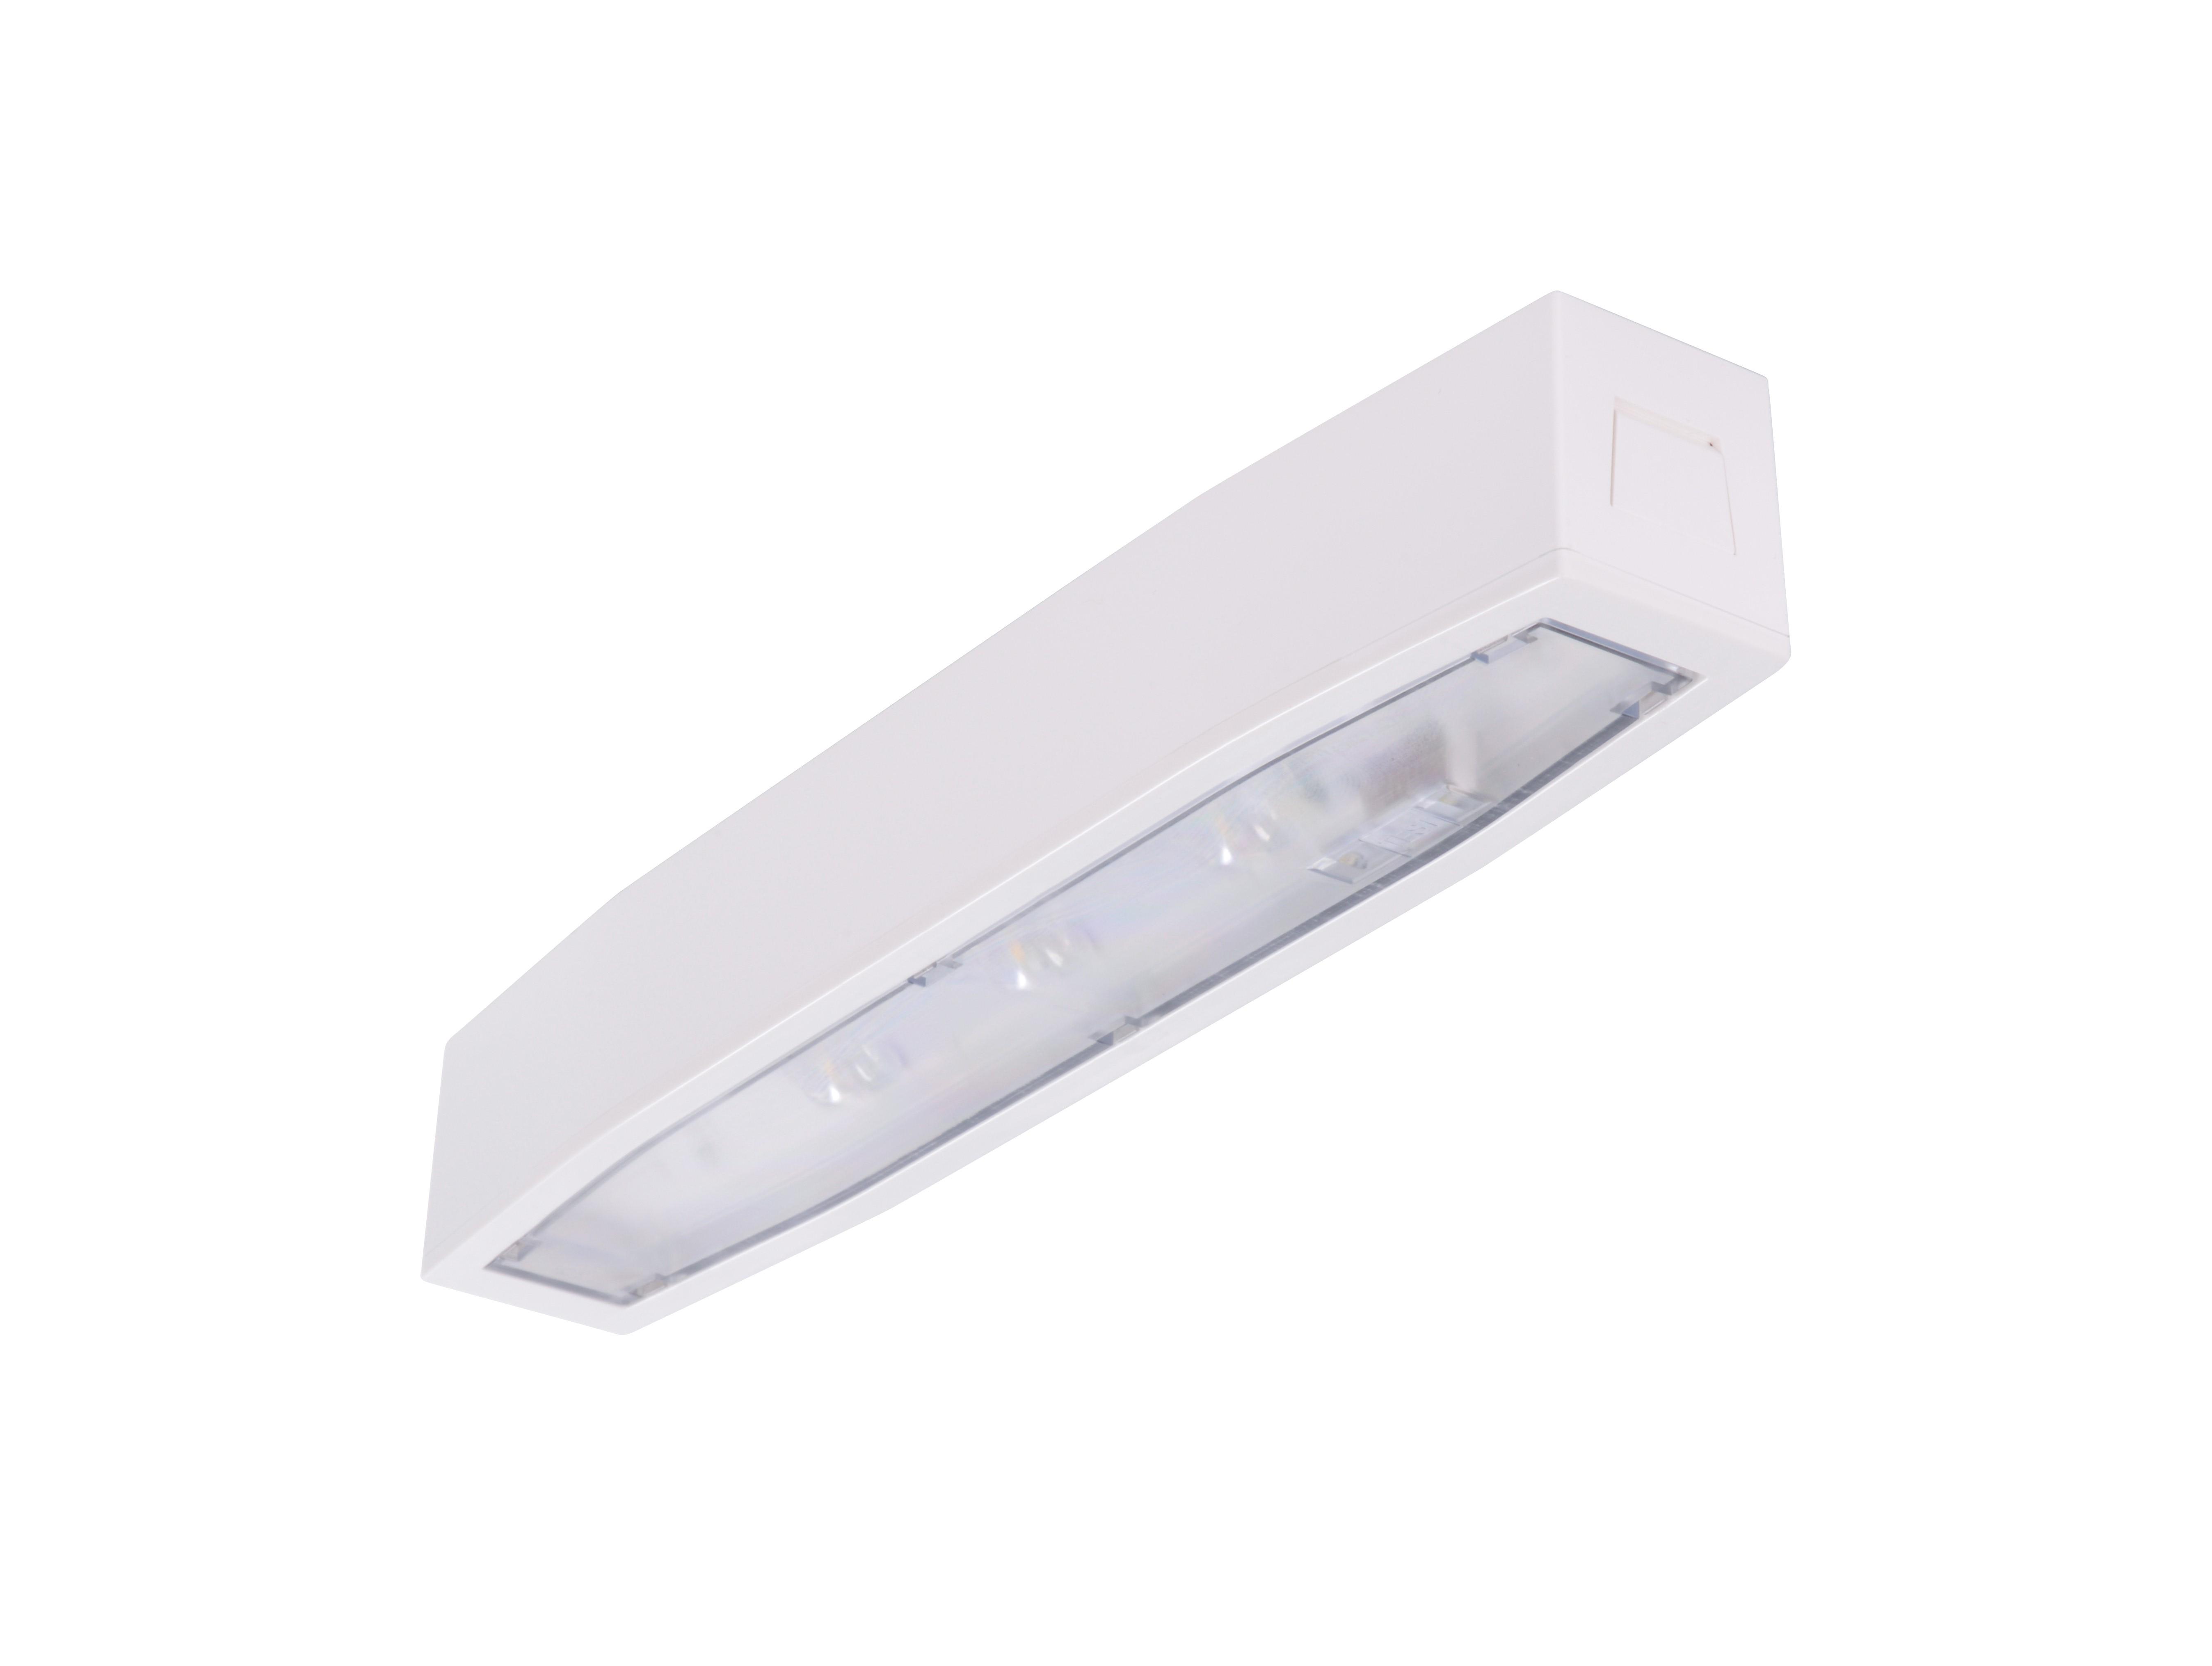 Lampa emergenta led Intelight 94756   3h mentinut test automat 0